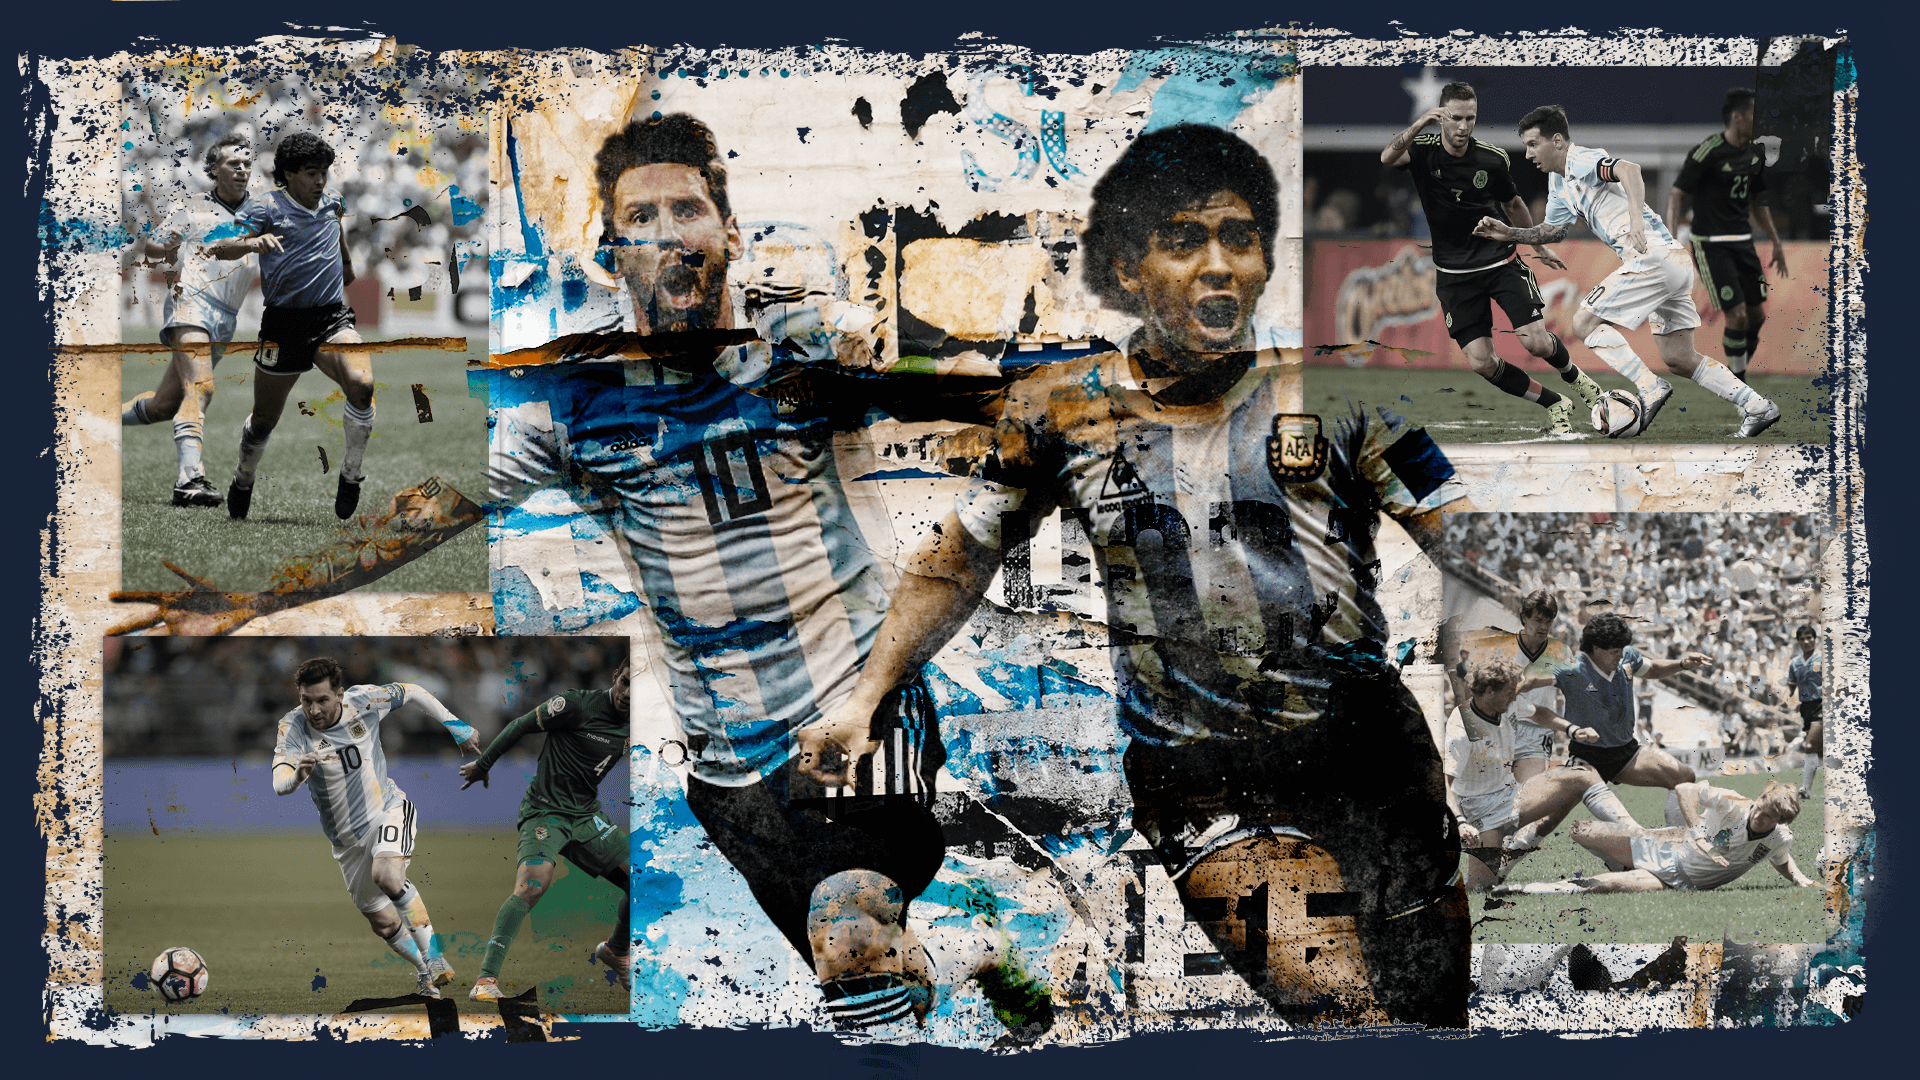 Diego Maradona Napoli S Patron Saint And Champion